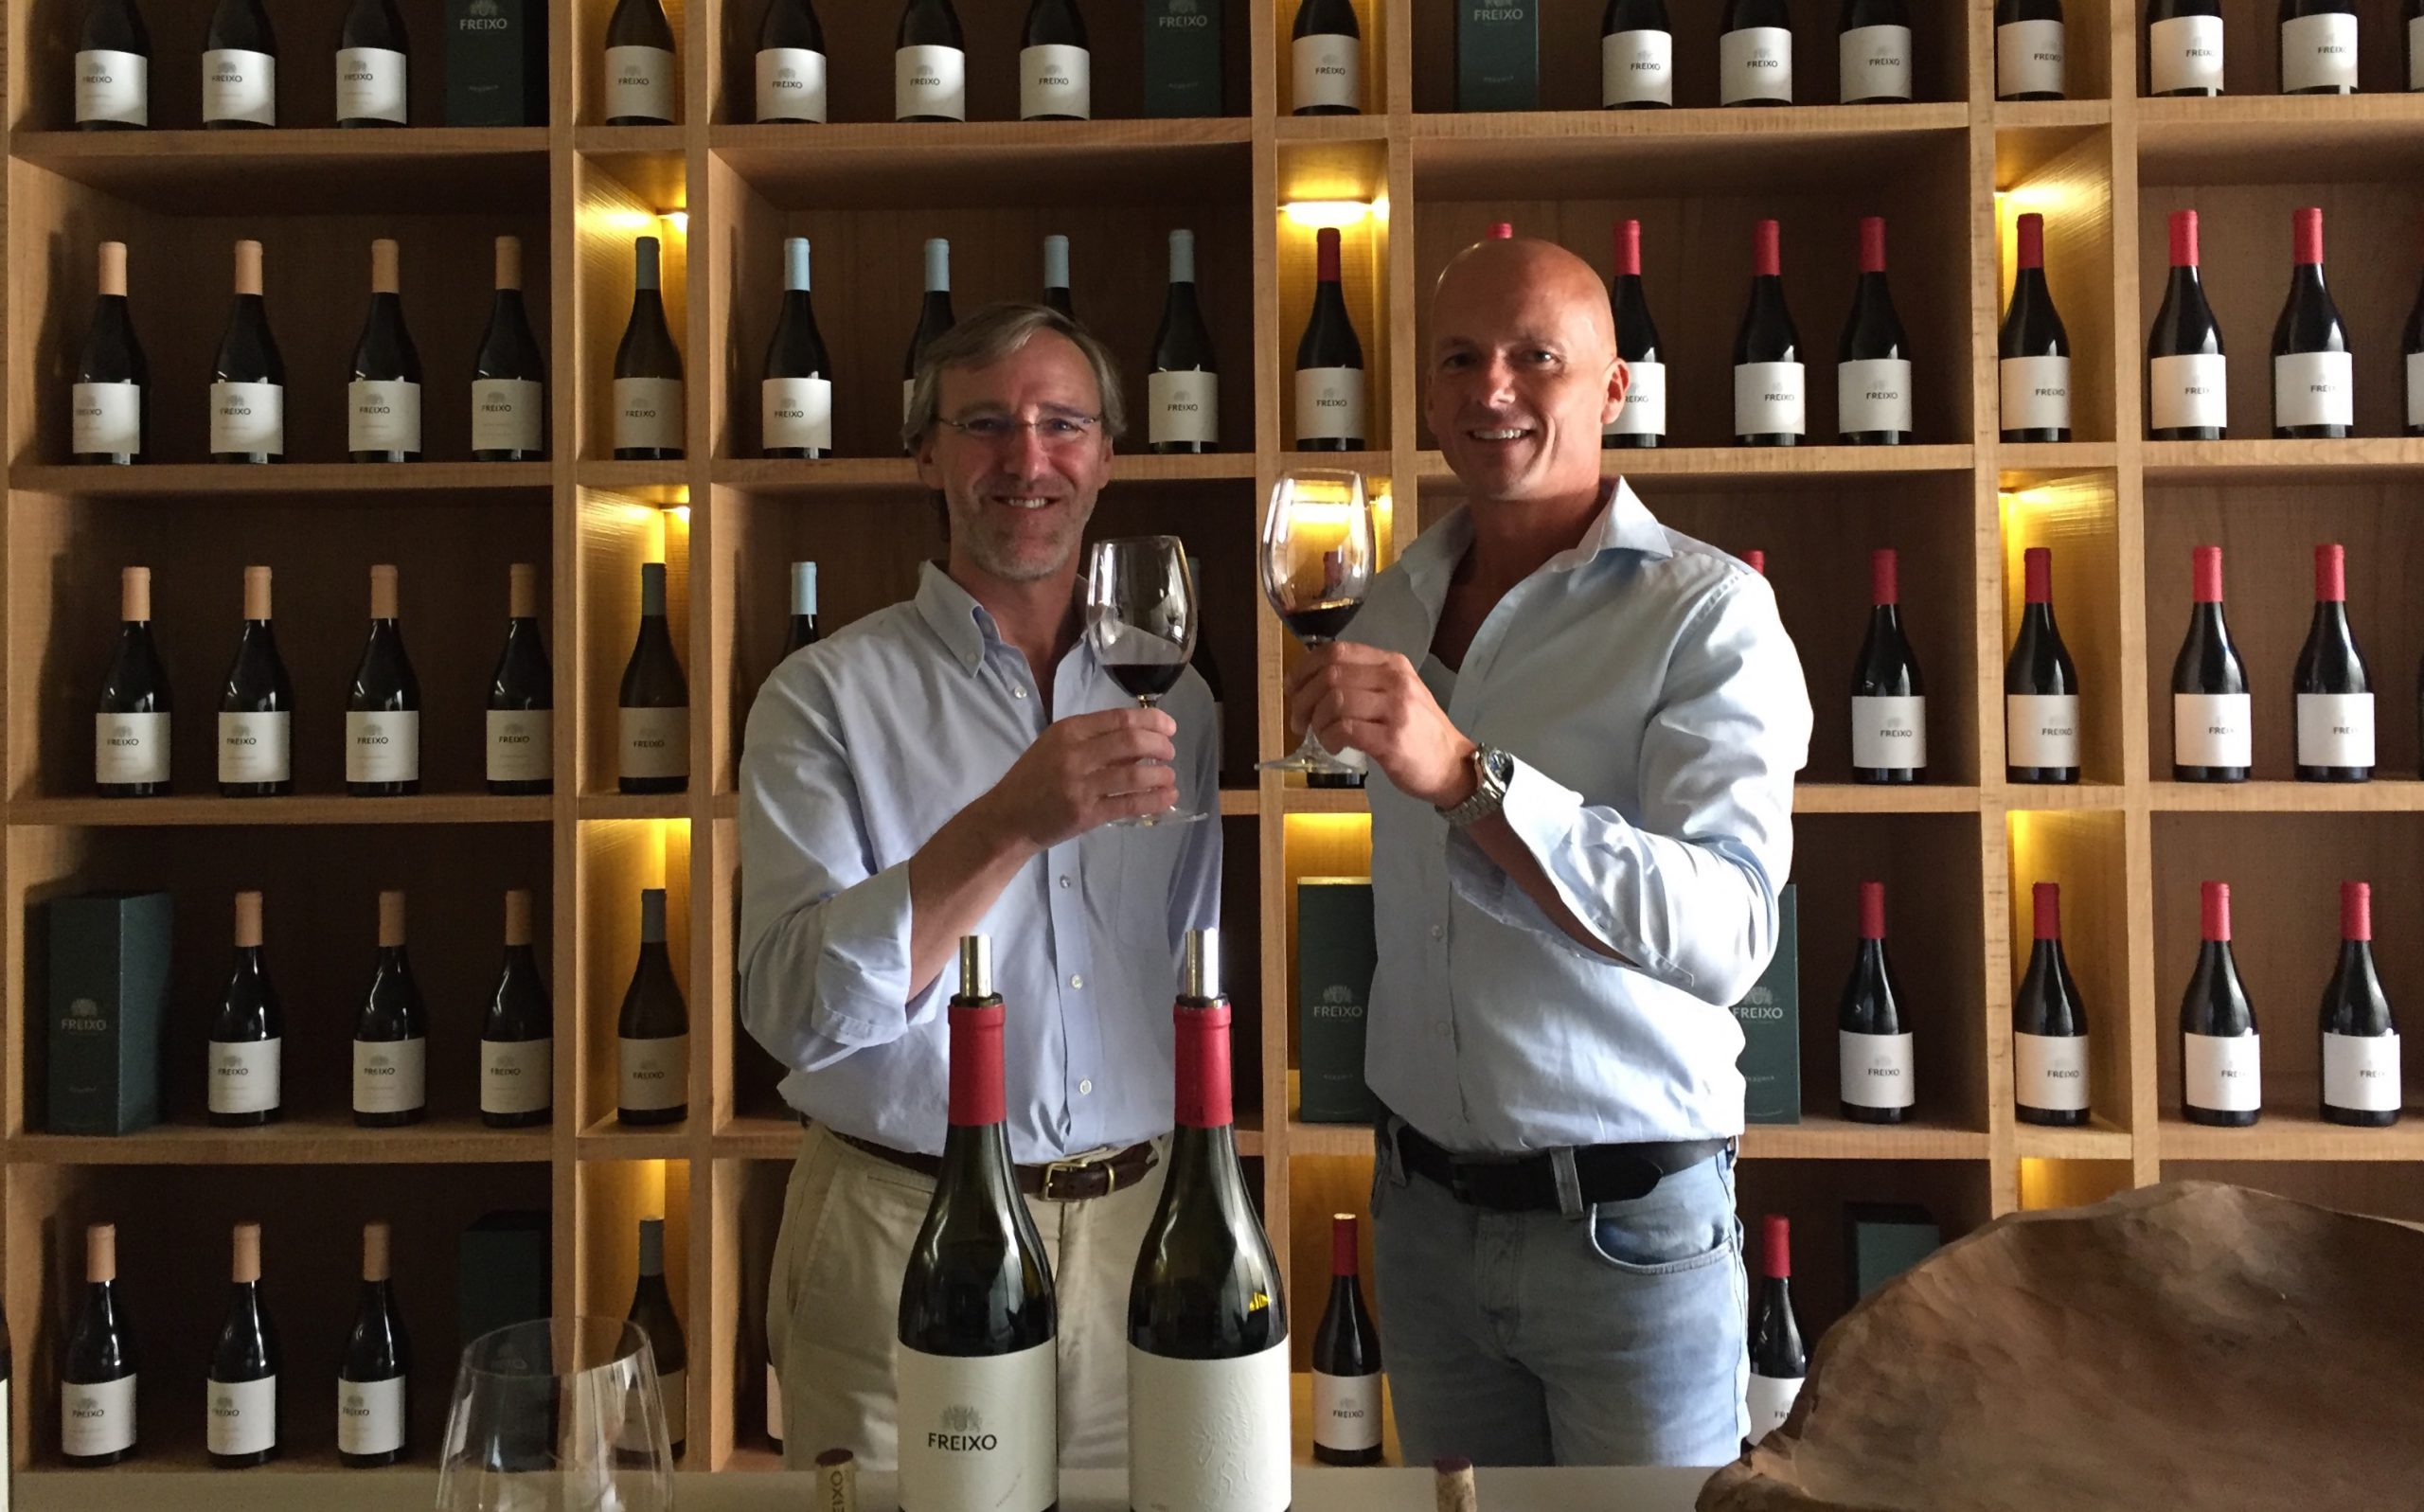 Herdade do Freixo Pedro de Vasconcellos e Souza & Joost van Ravenzwaaij Wine Import